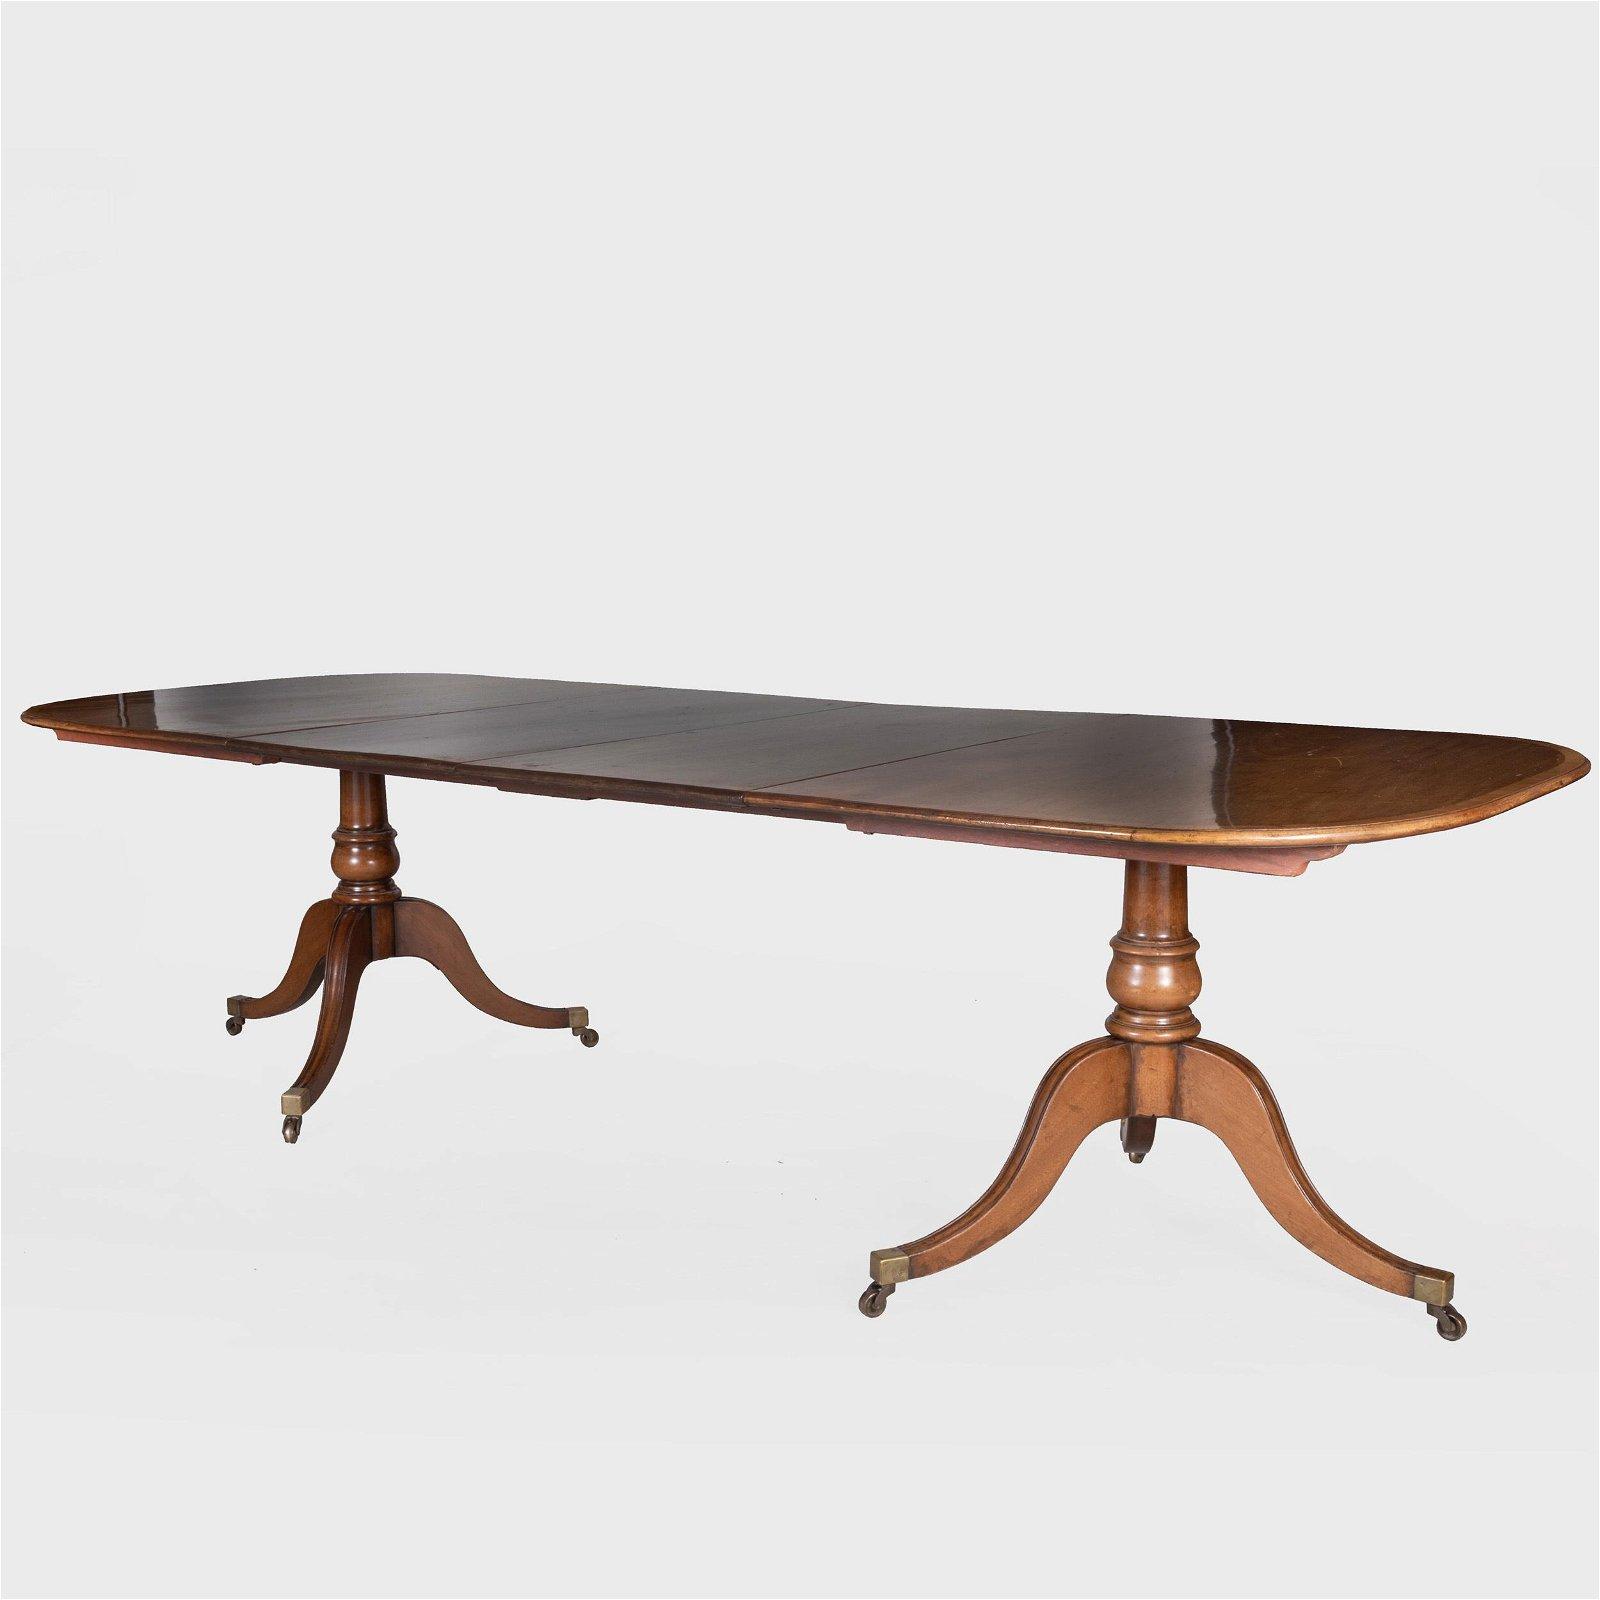 Regency Inlaid Mahogany Twin Pedestal Dining Table